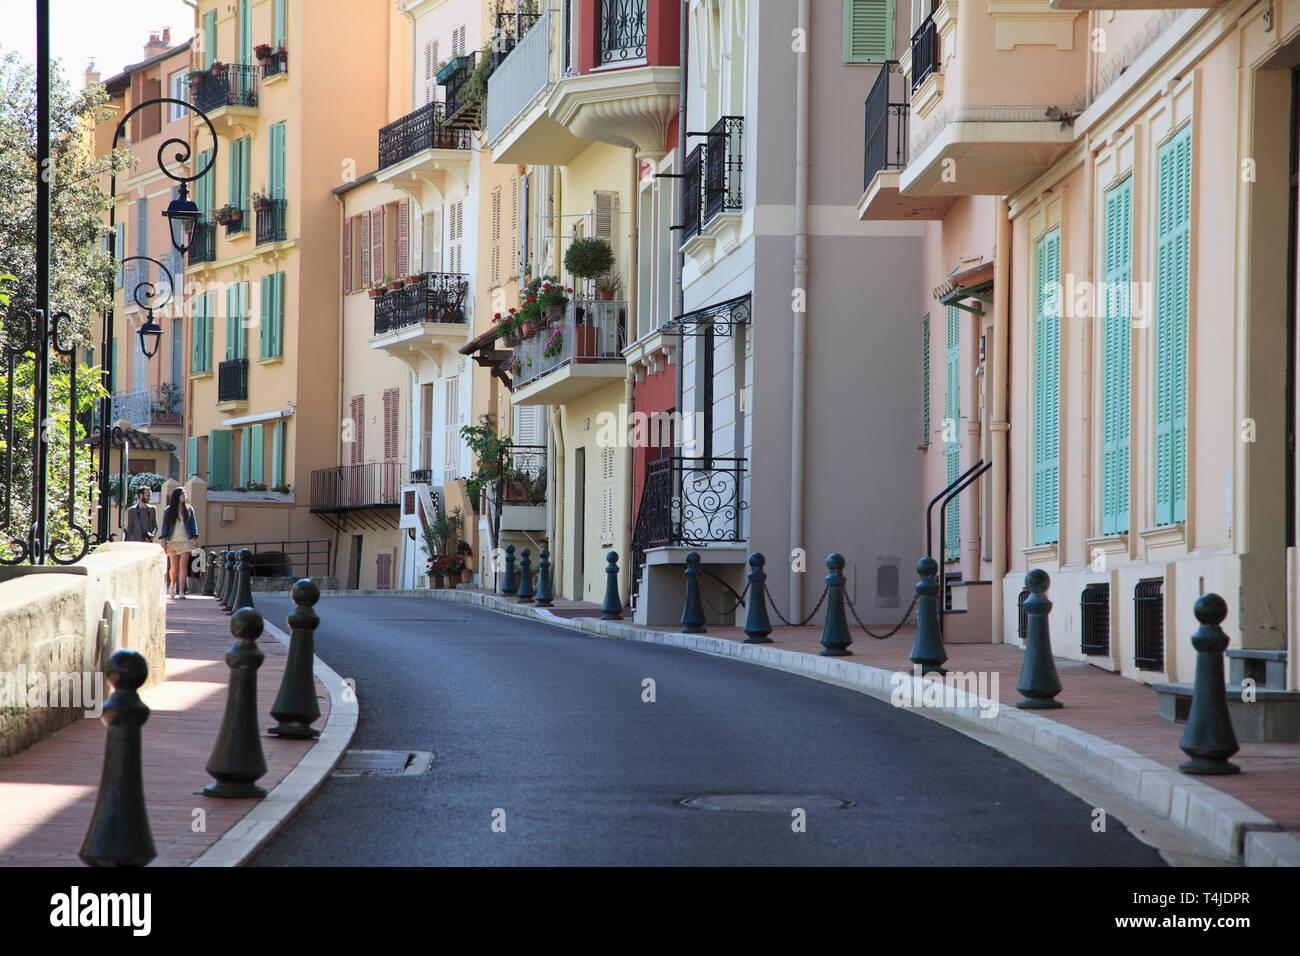 Monaco-Ville, Old Town, Le Rocher, The Rock, Monaco, Cote d Azur, Mediterranean, Europe - Stock Image